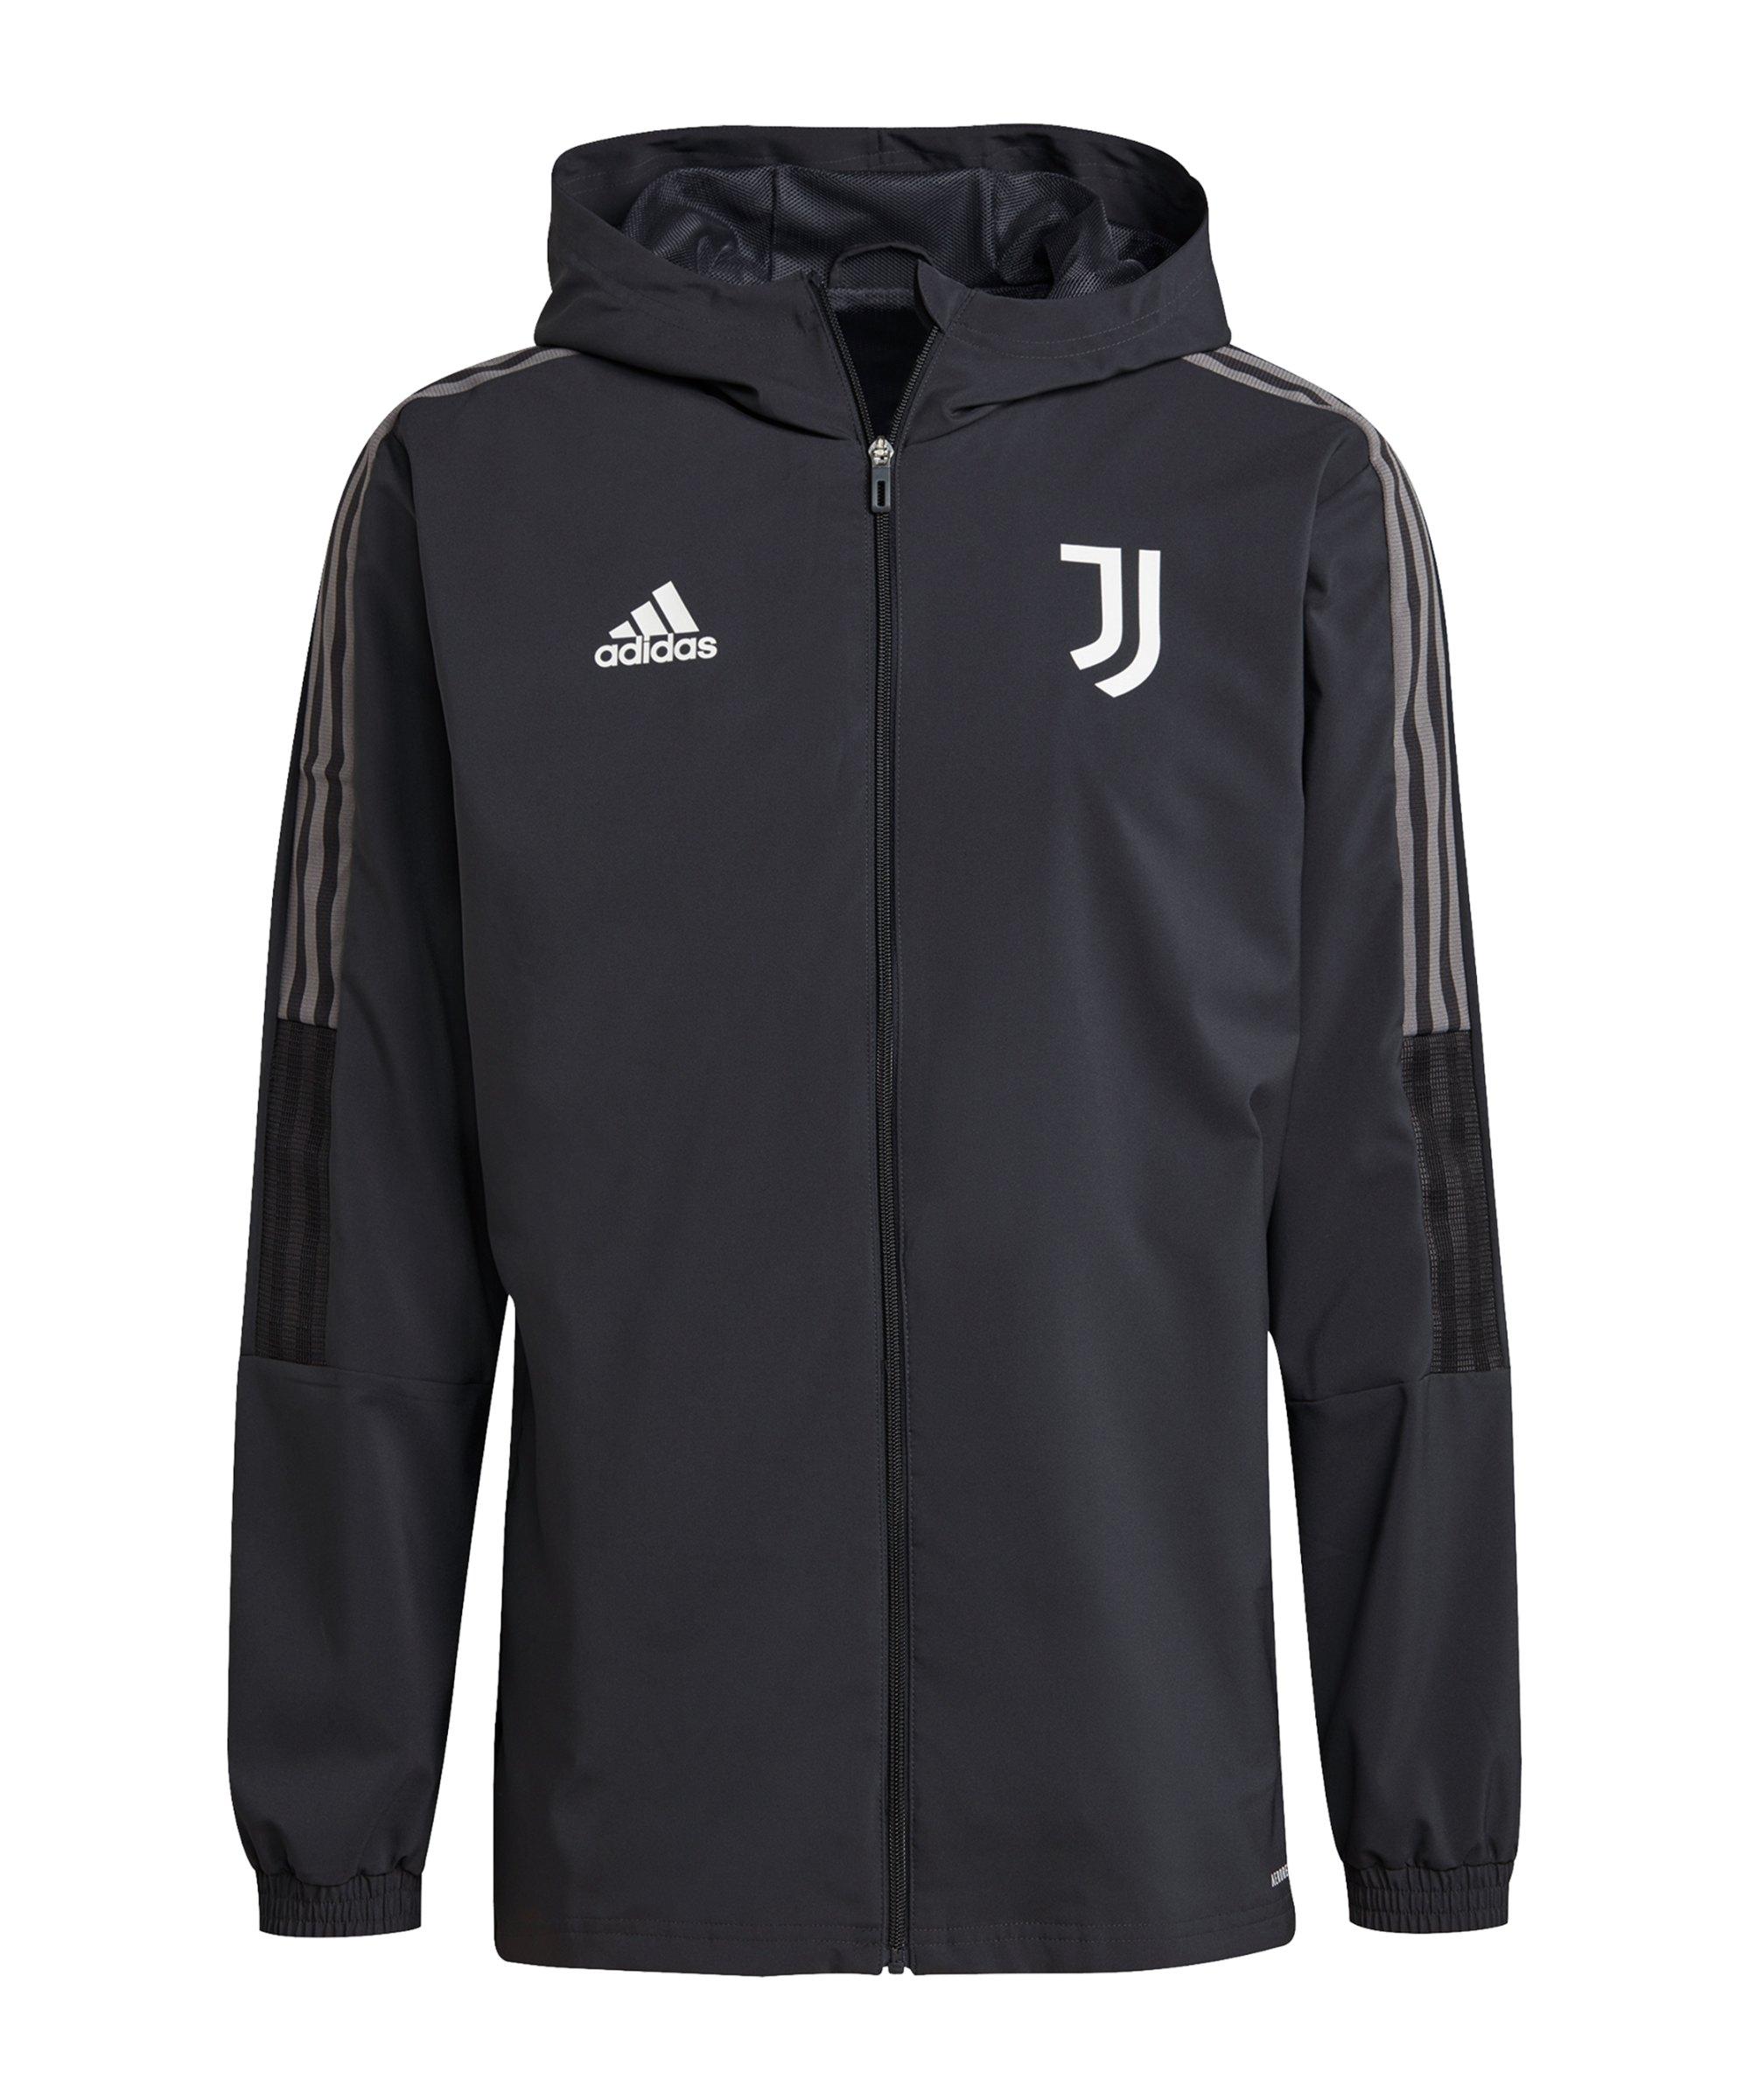 adidas Juventus Turin Prematch Jacke 2021/2022 Grau - grau